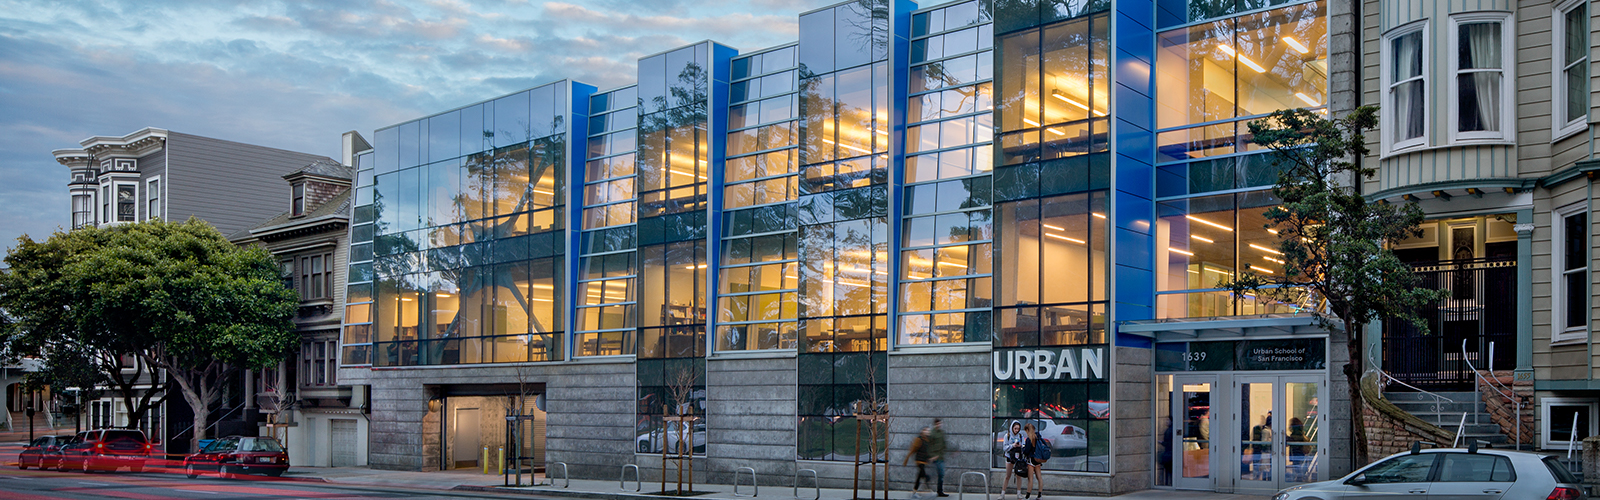 The Urban School - San Francisco, CA: